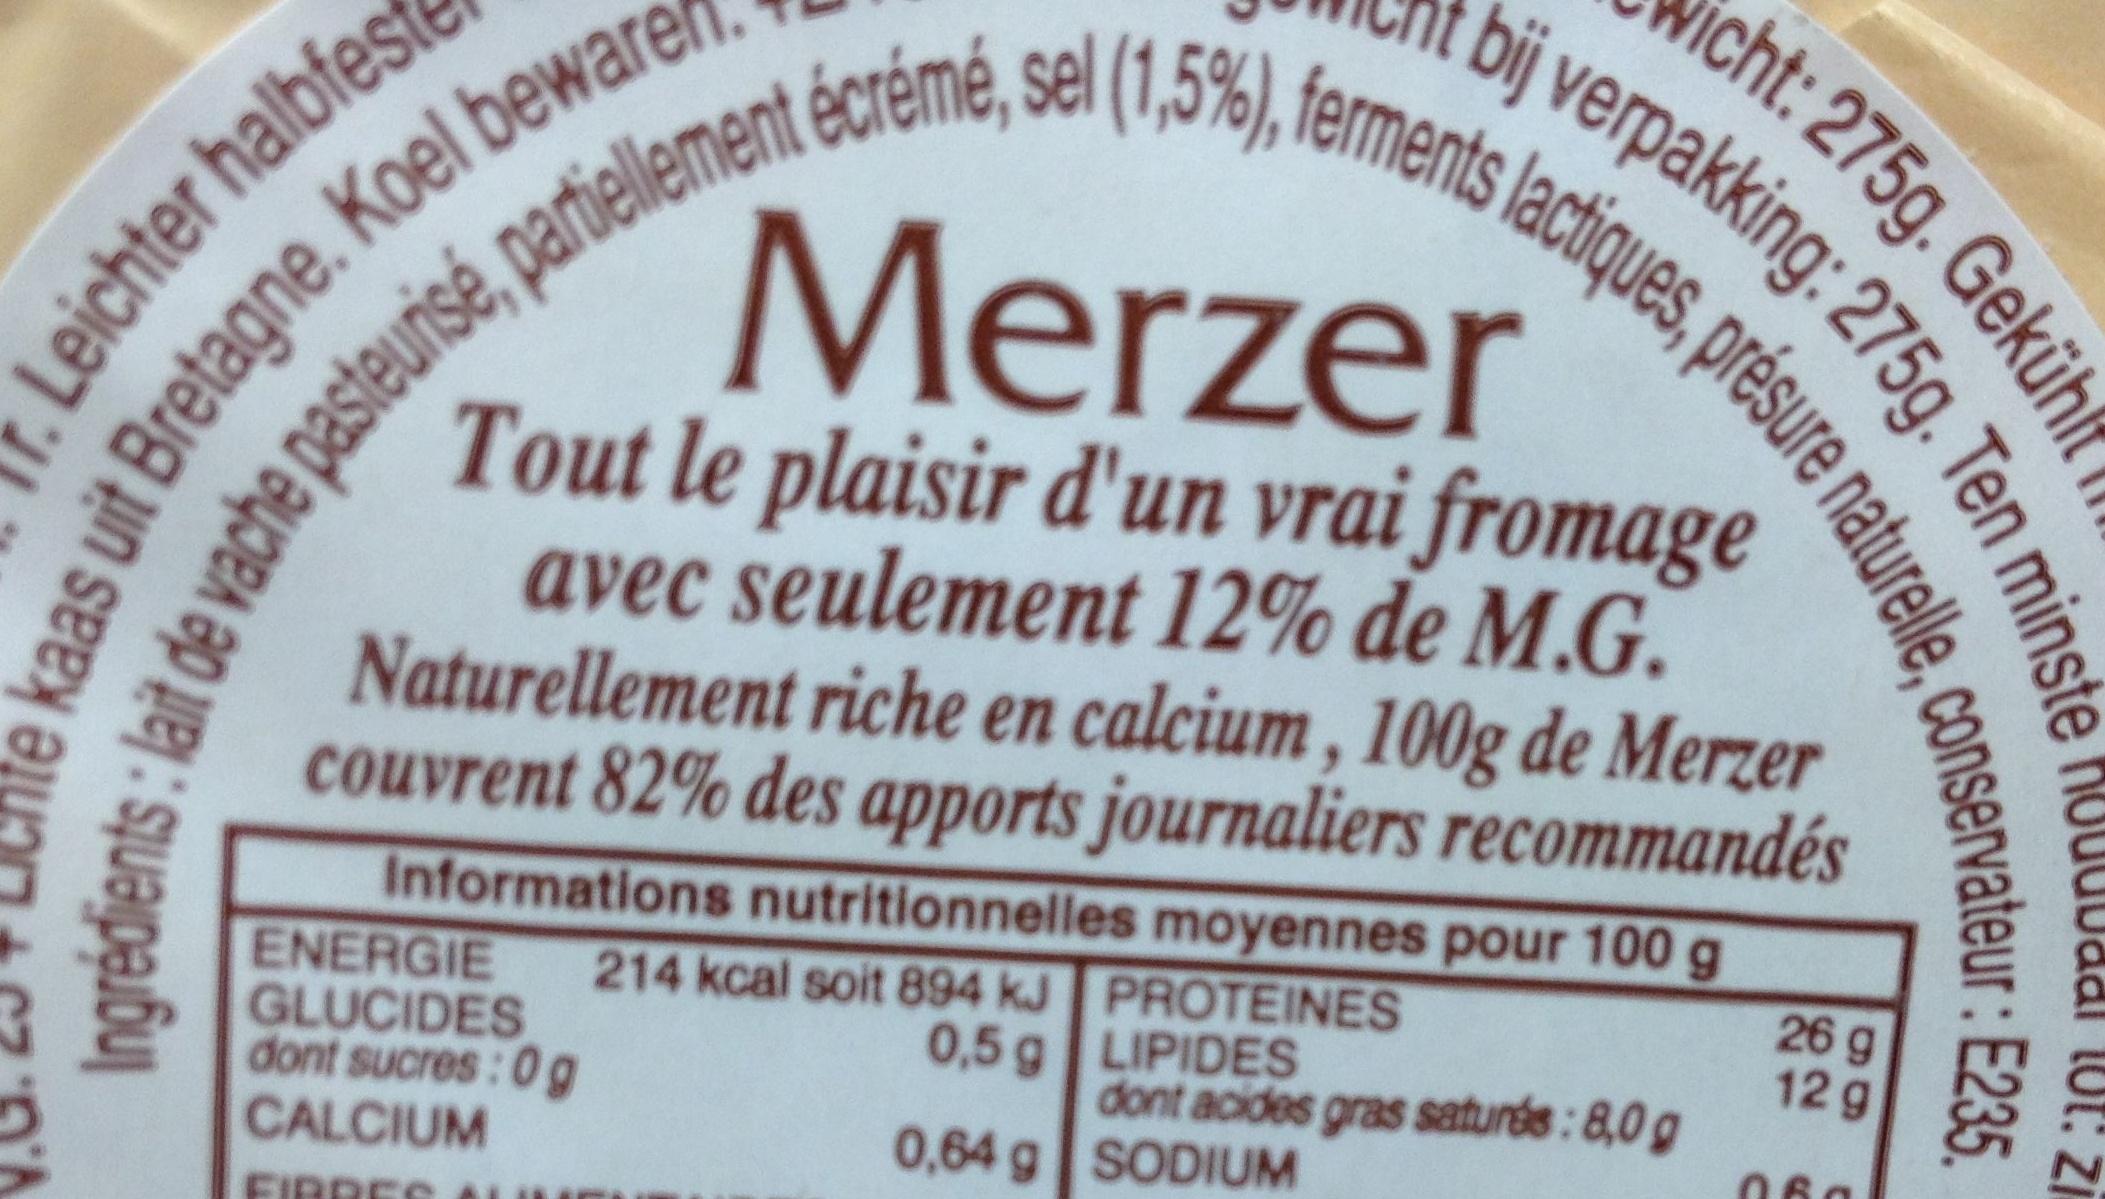 Merzer (12% MG) - Ingrédients - fr